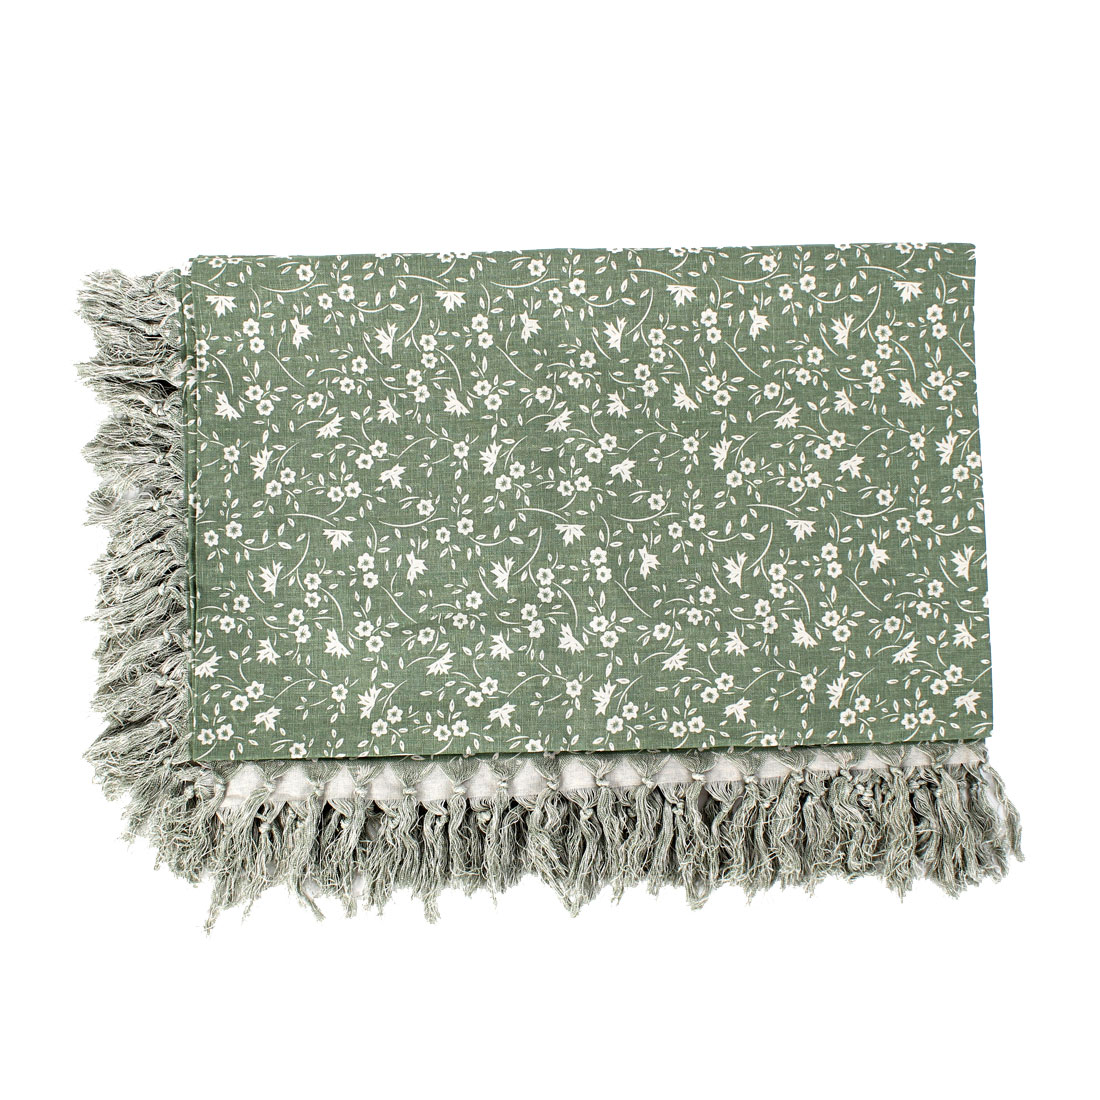 Green Rectangle Design Cotton Table Cover Tablecloth 190cm x 130cm